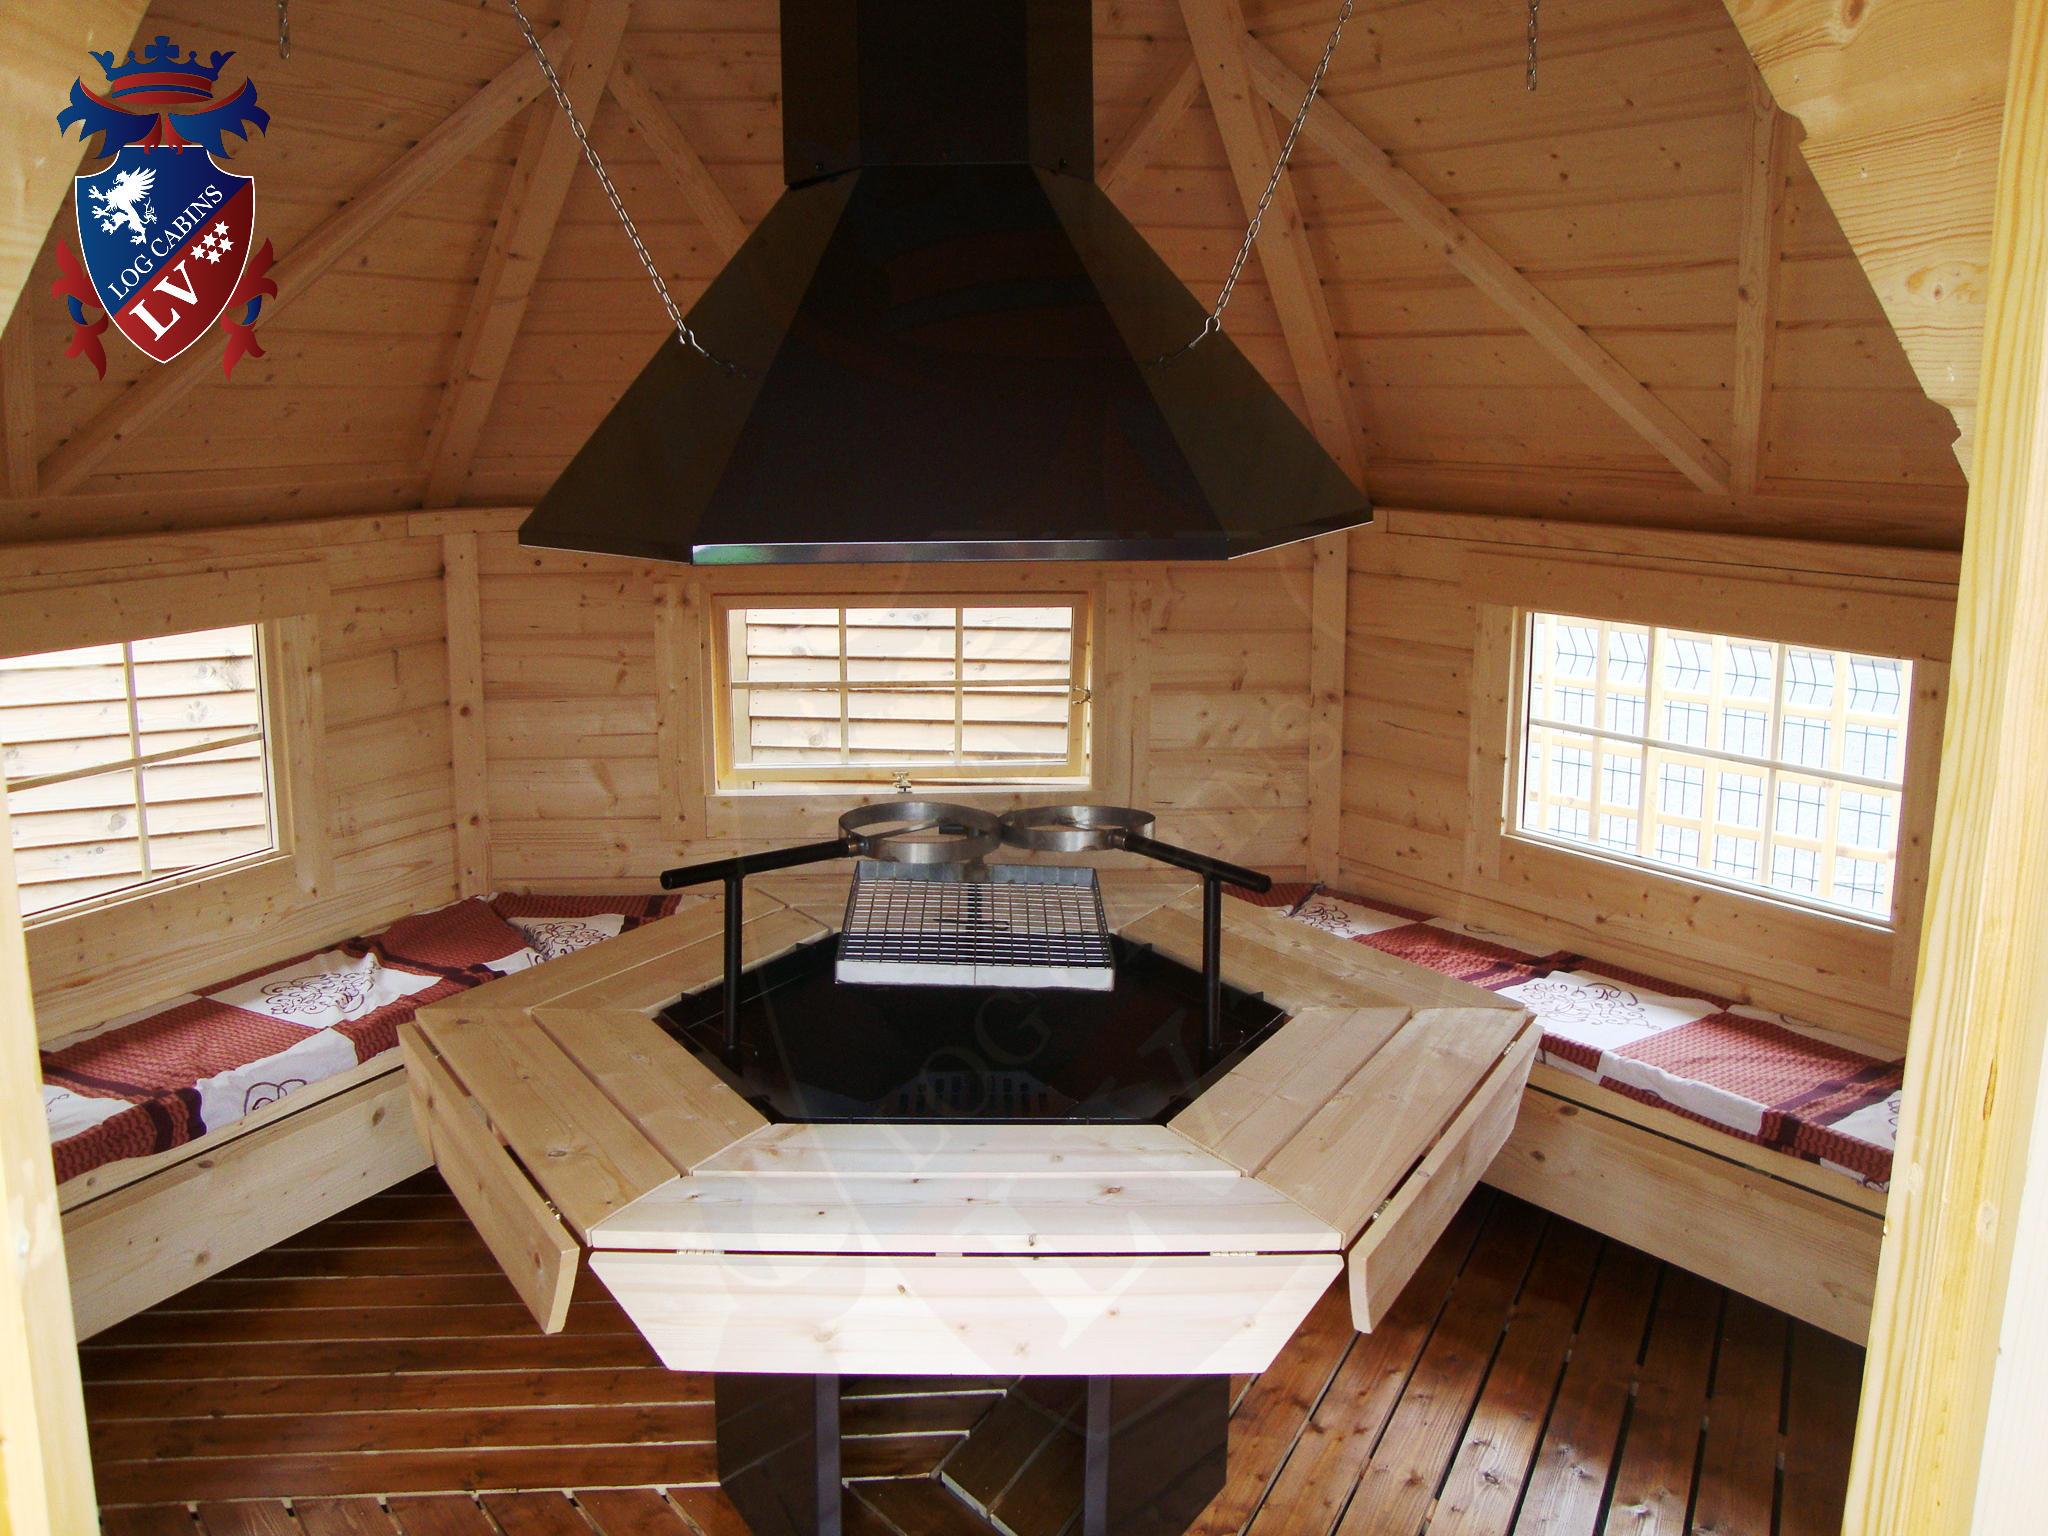 Bbq Grill Cabins Huts Kotas From Logcabins Lv Log Cabins